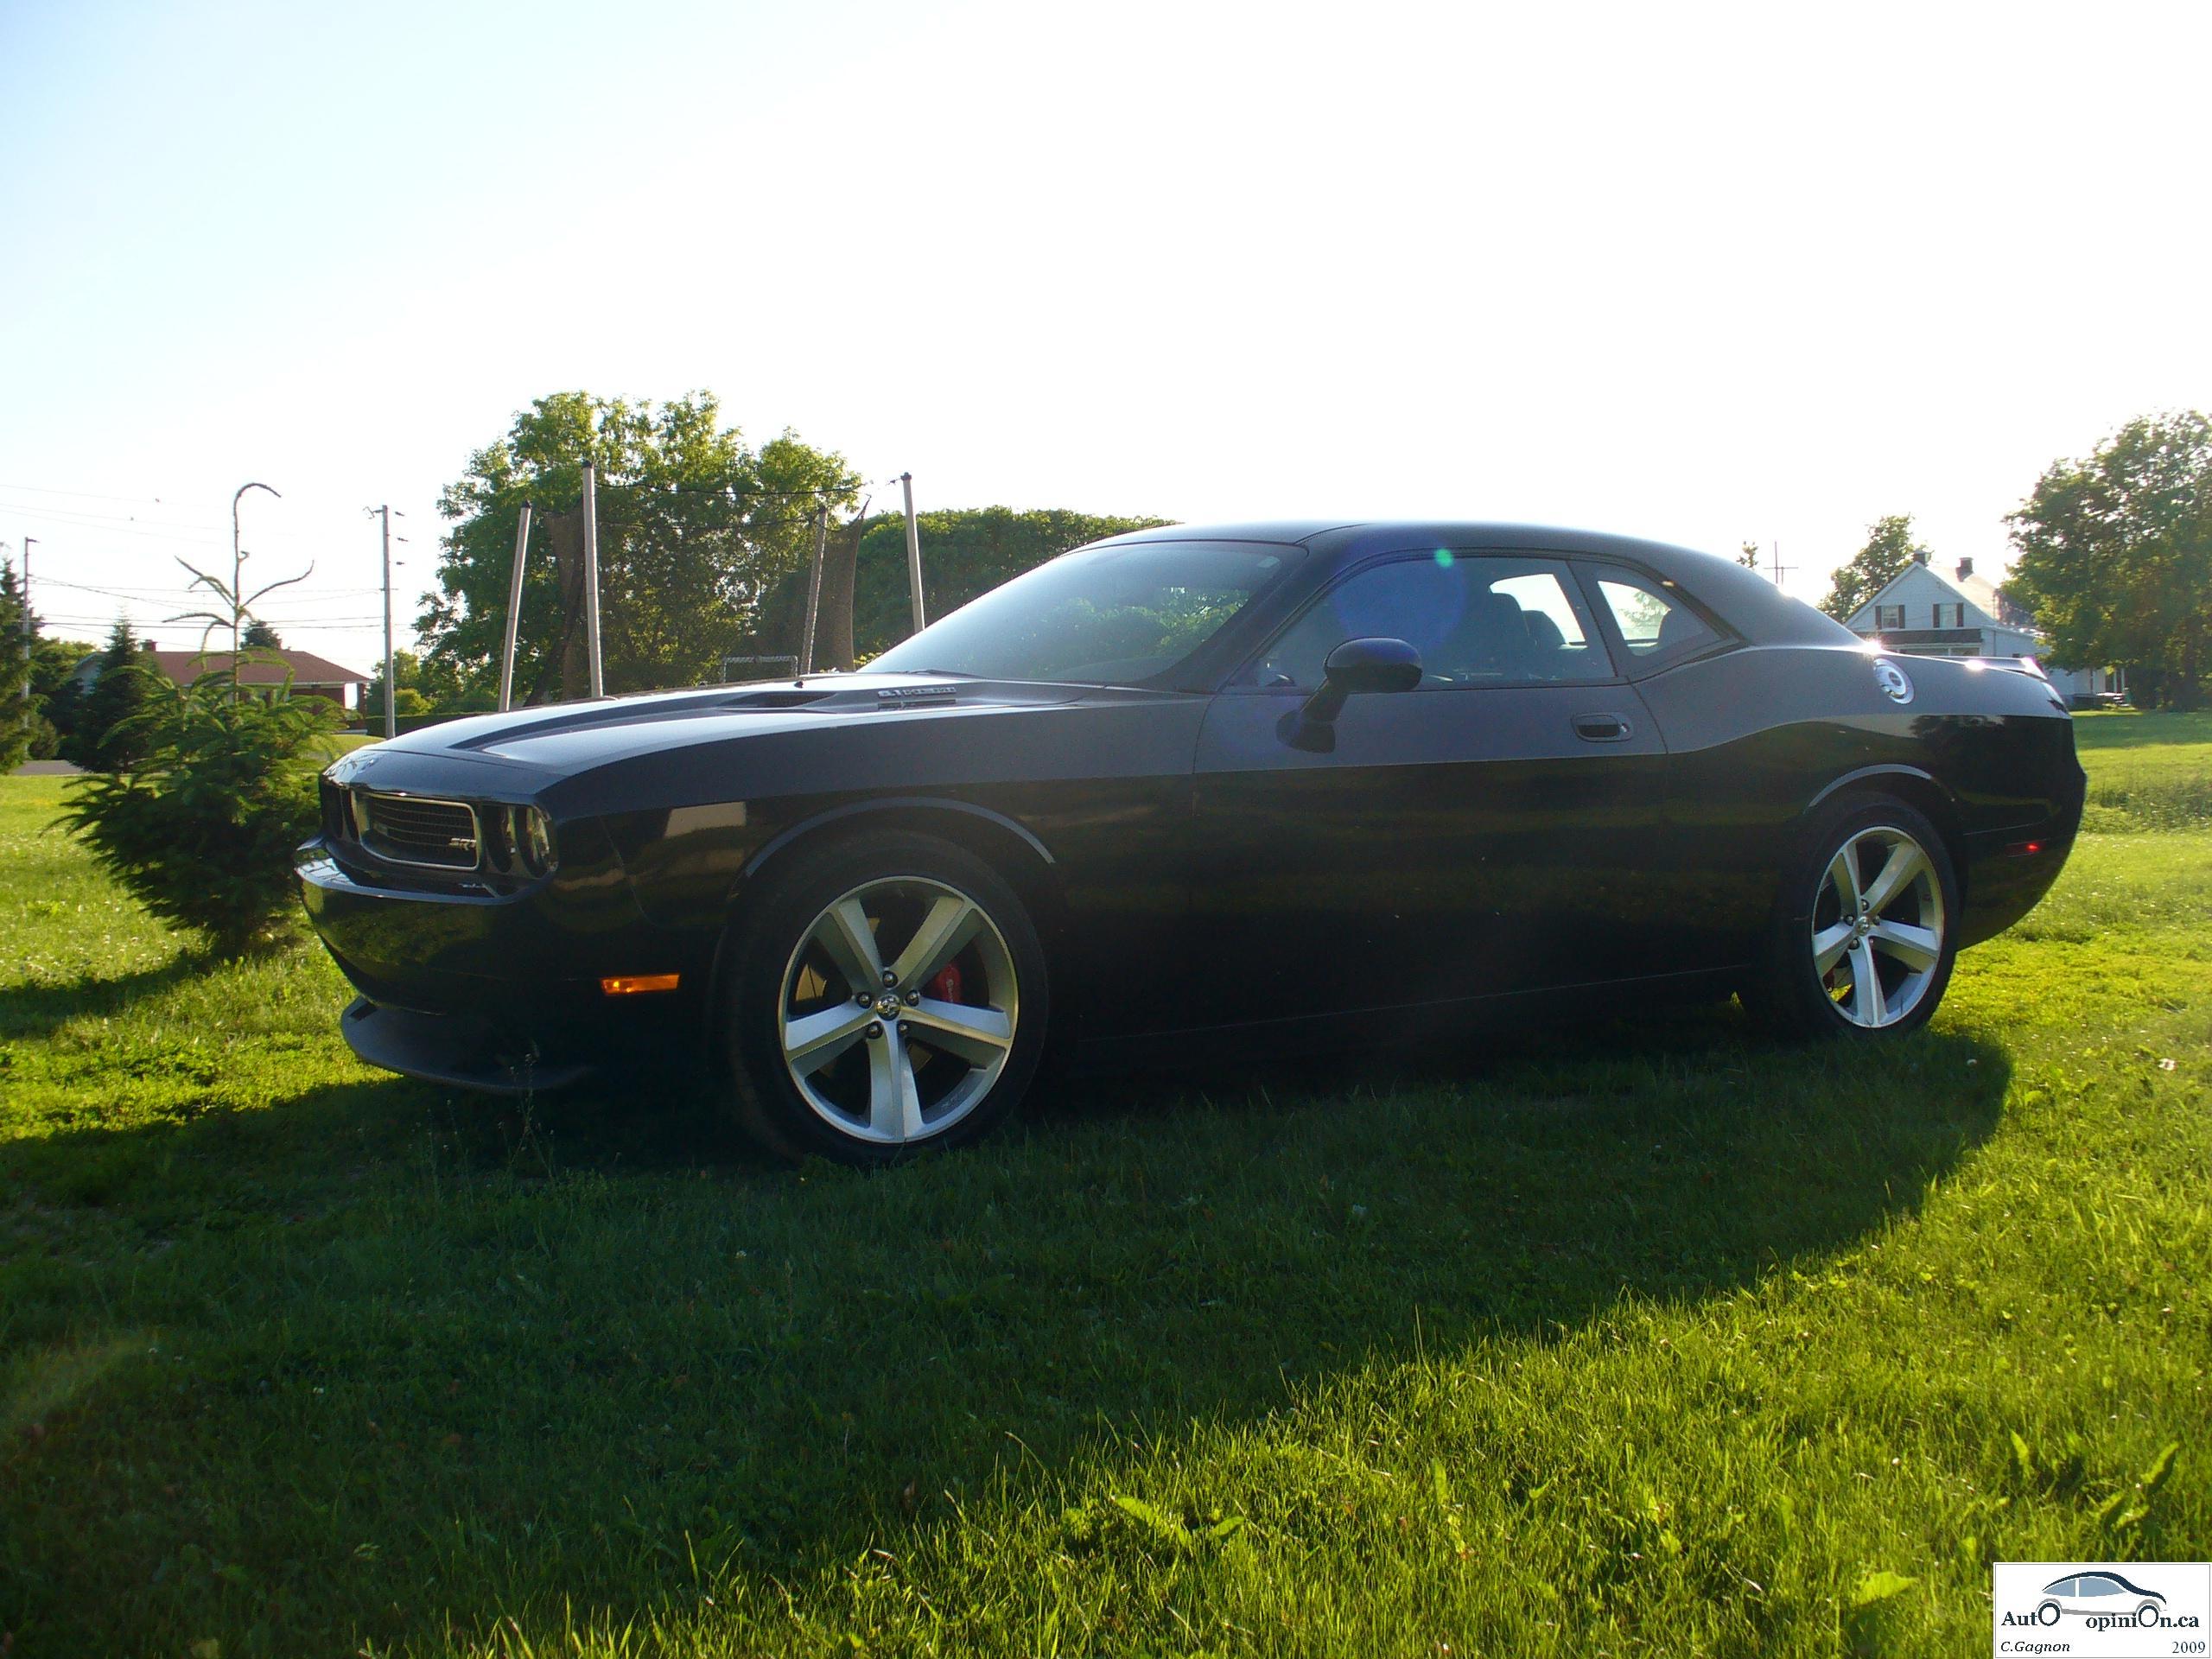 Essai routier complet: Dodge Challenger 2009